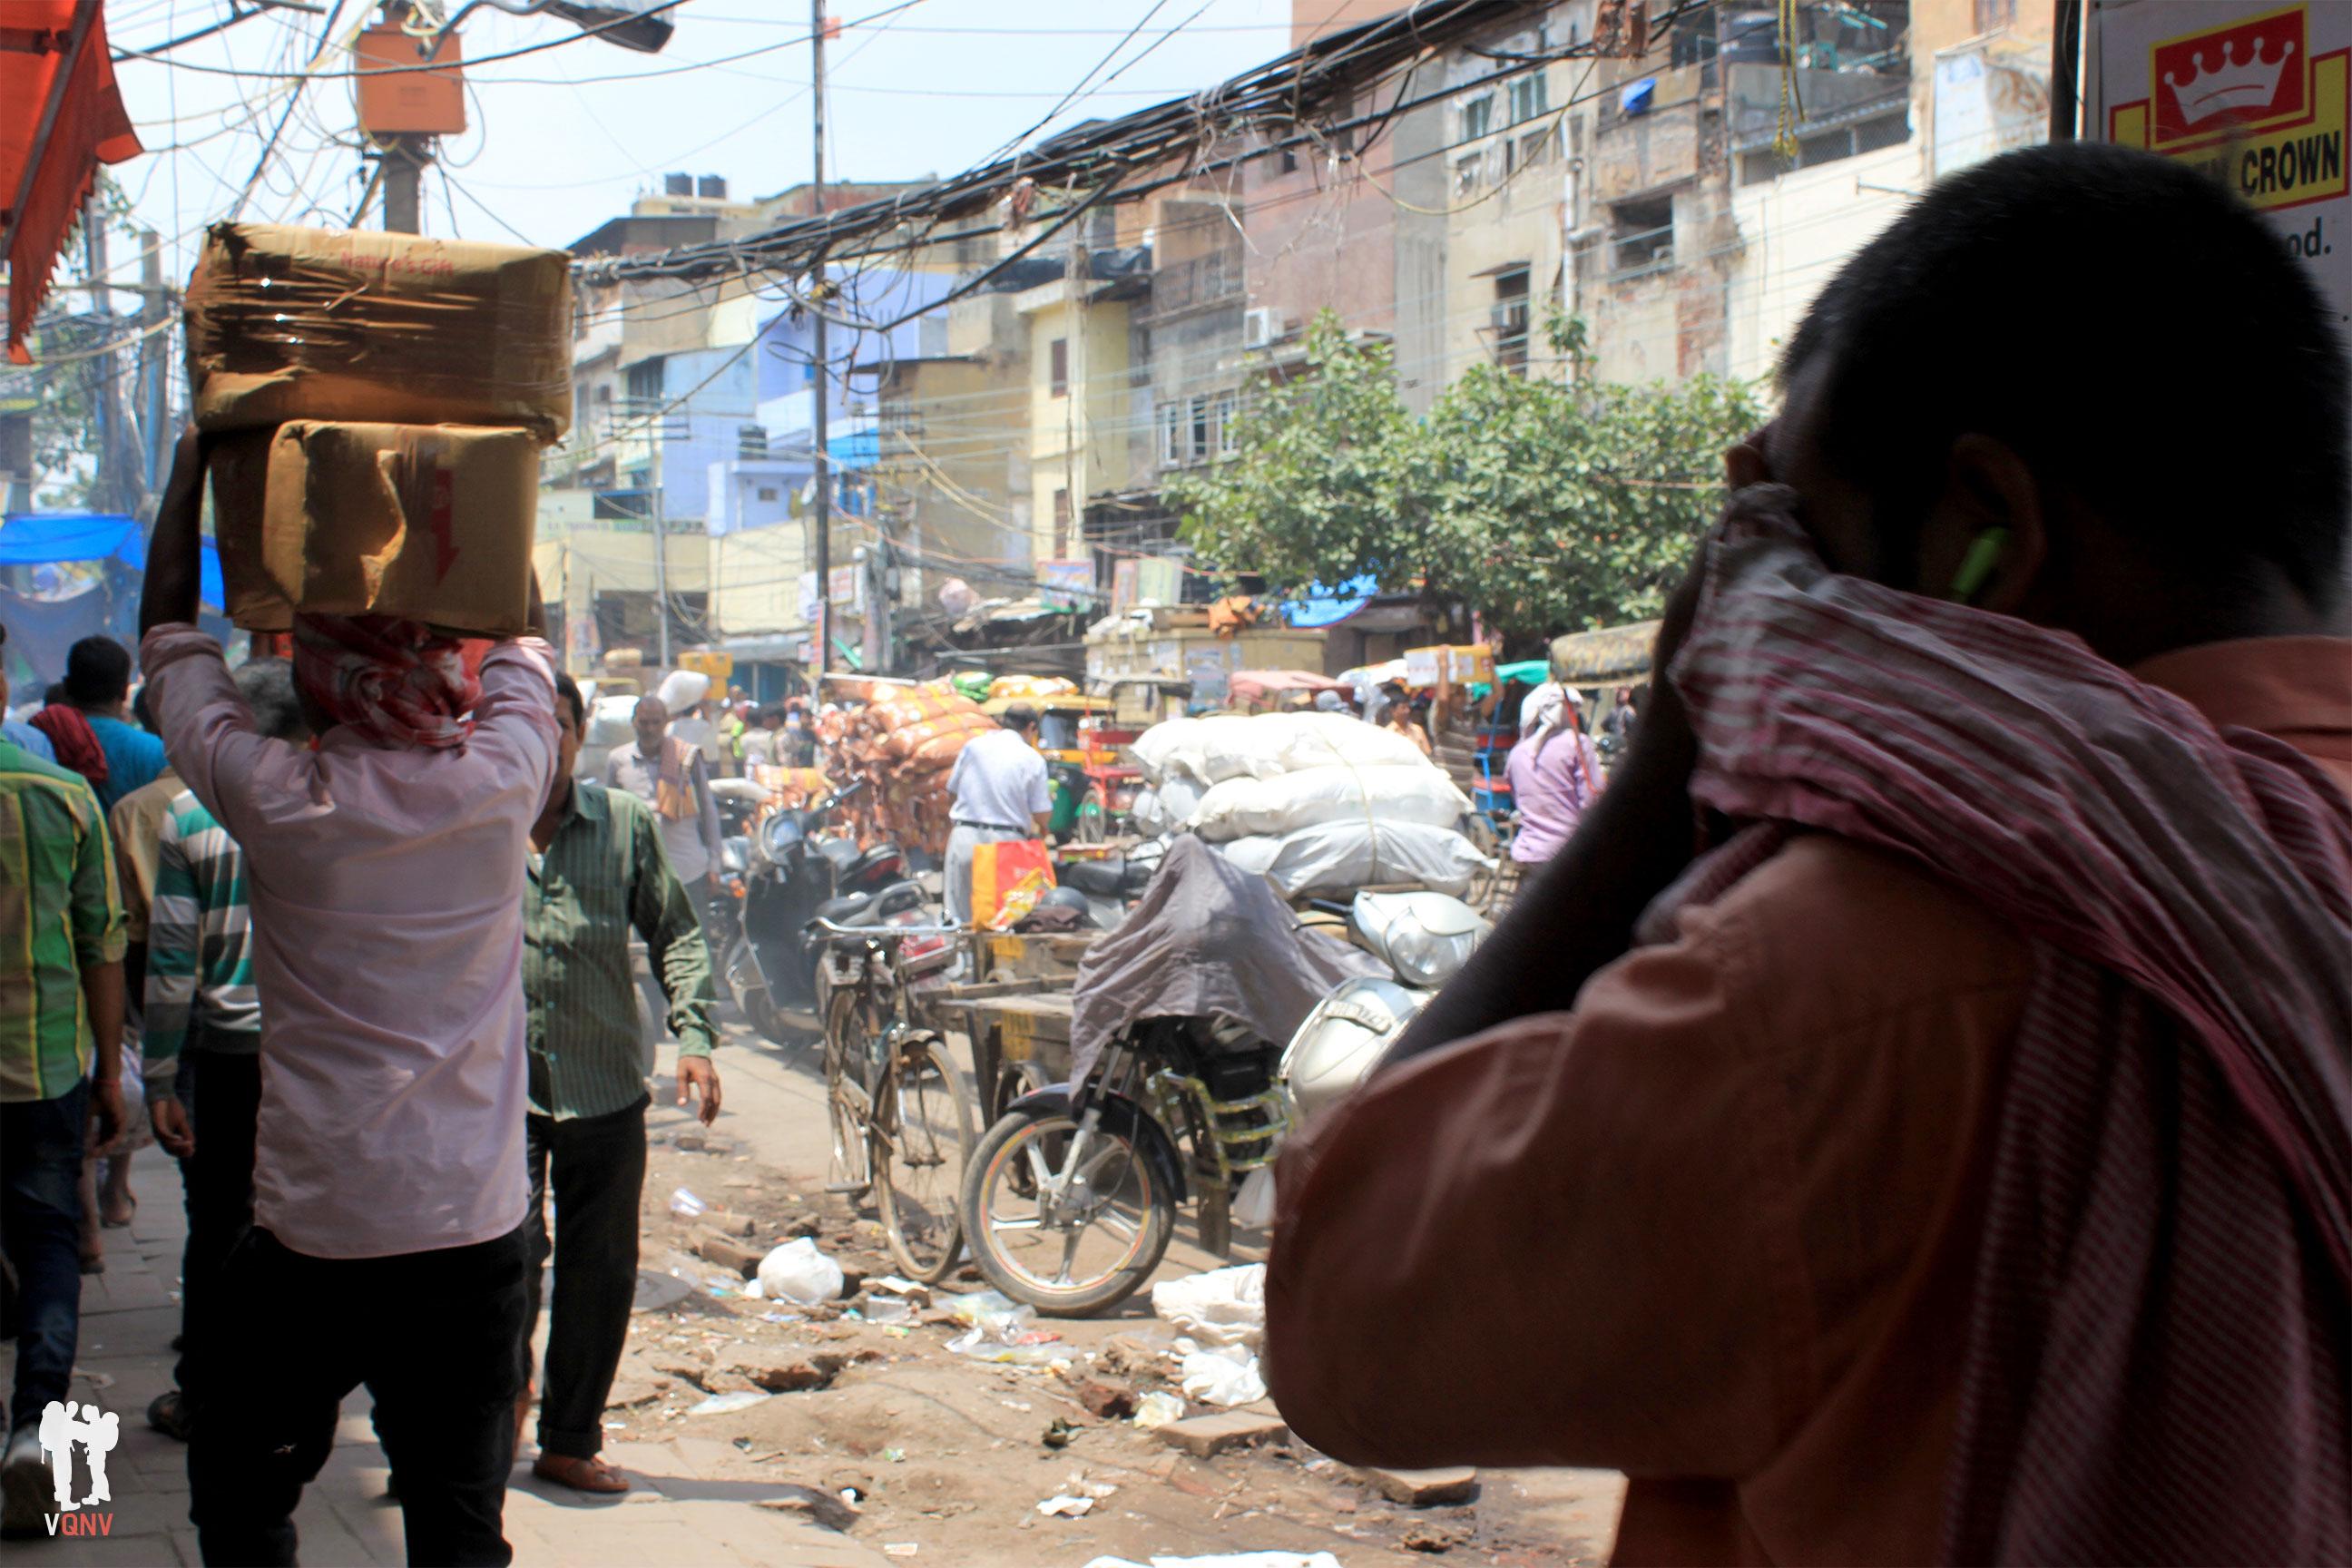 Calle ajetreada en Chandni Chowk